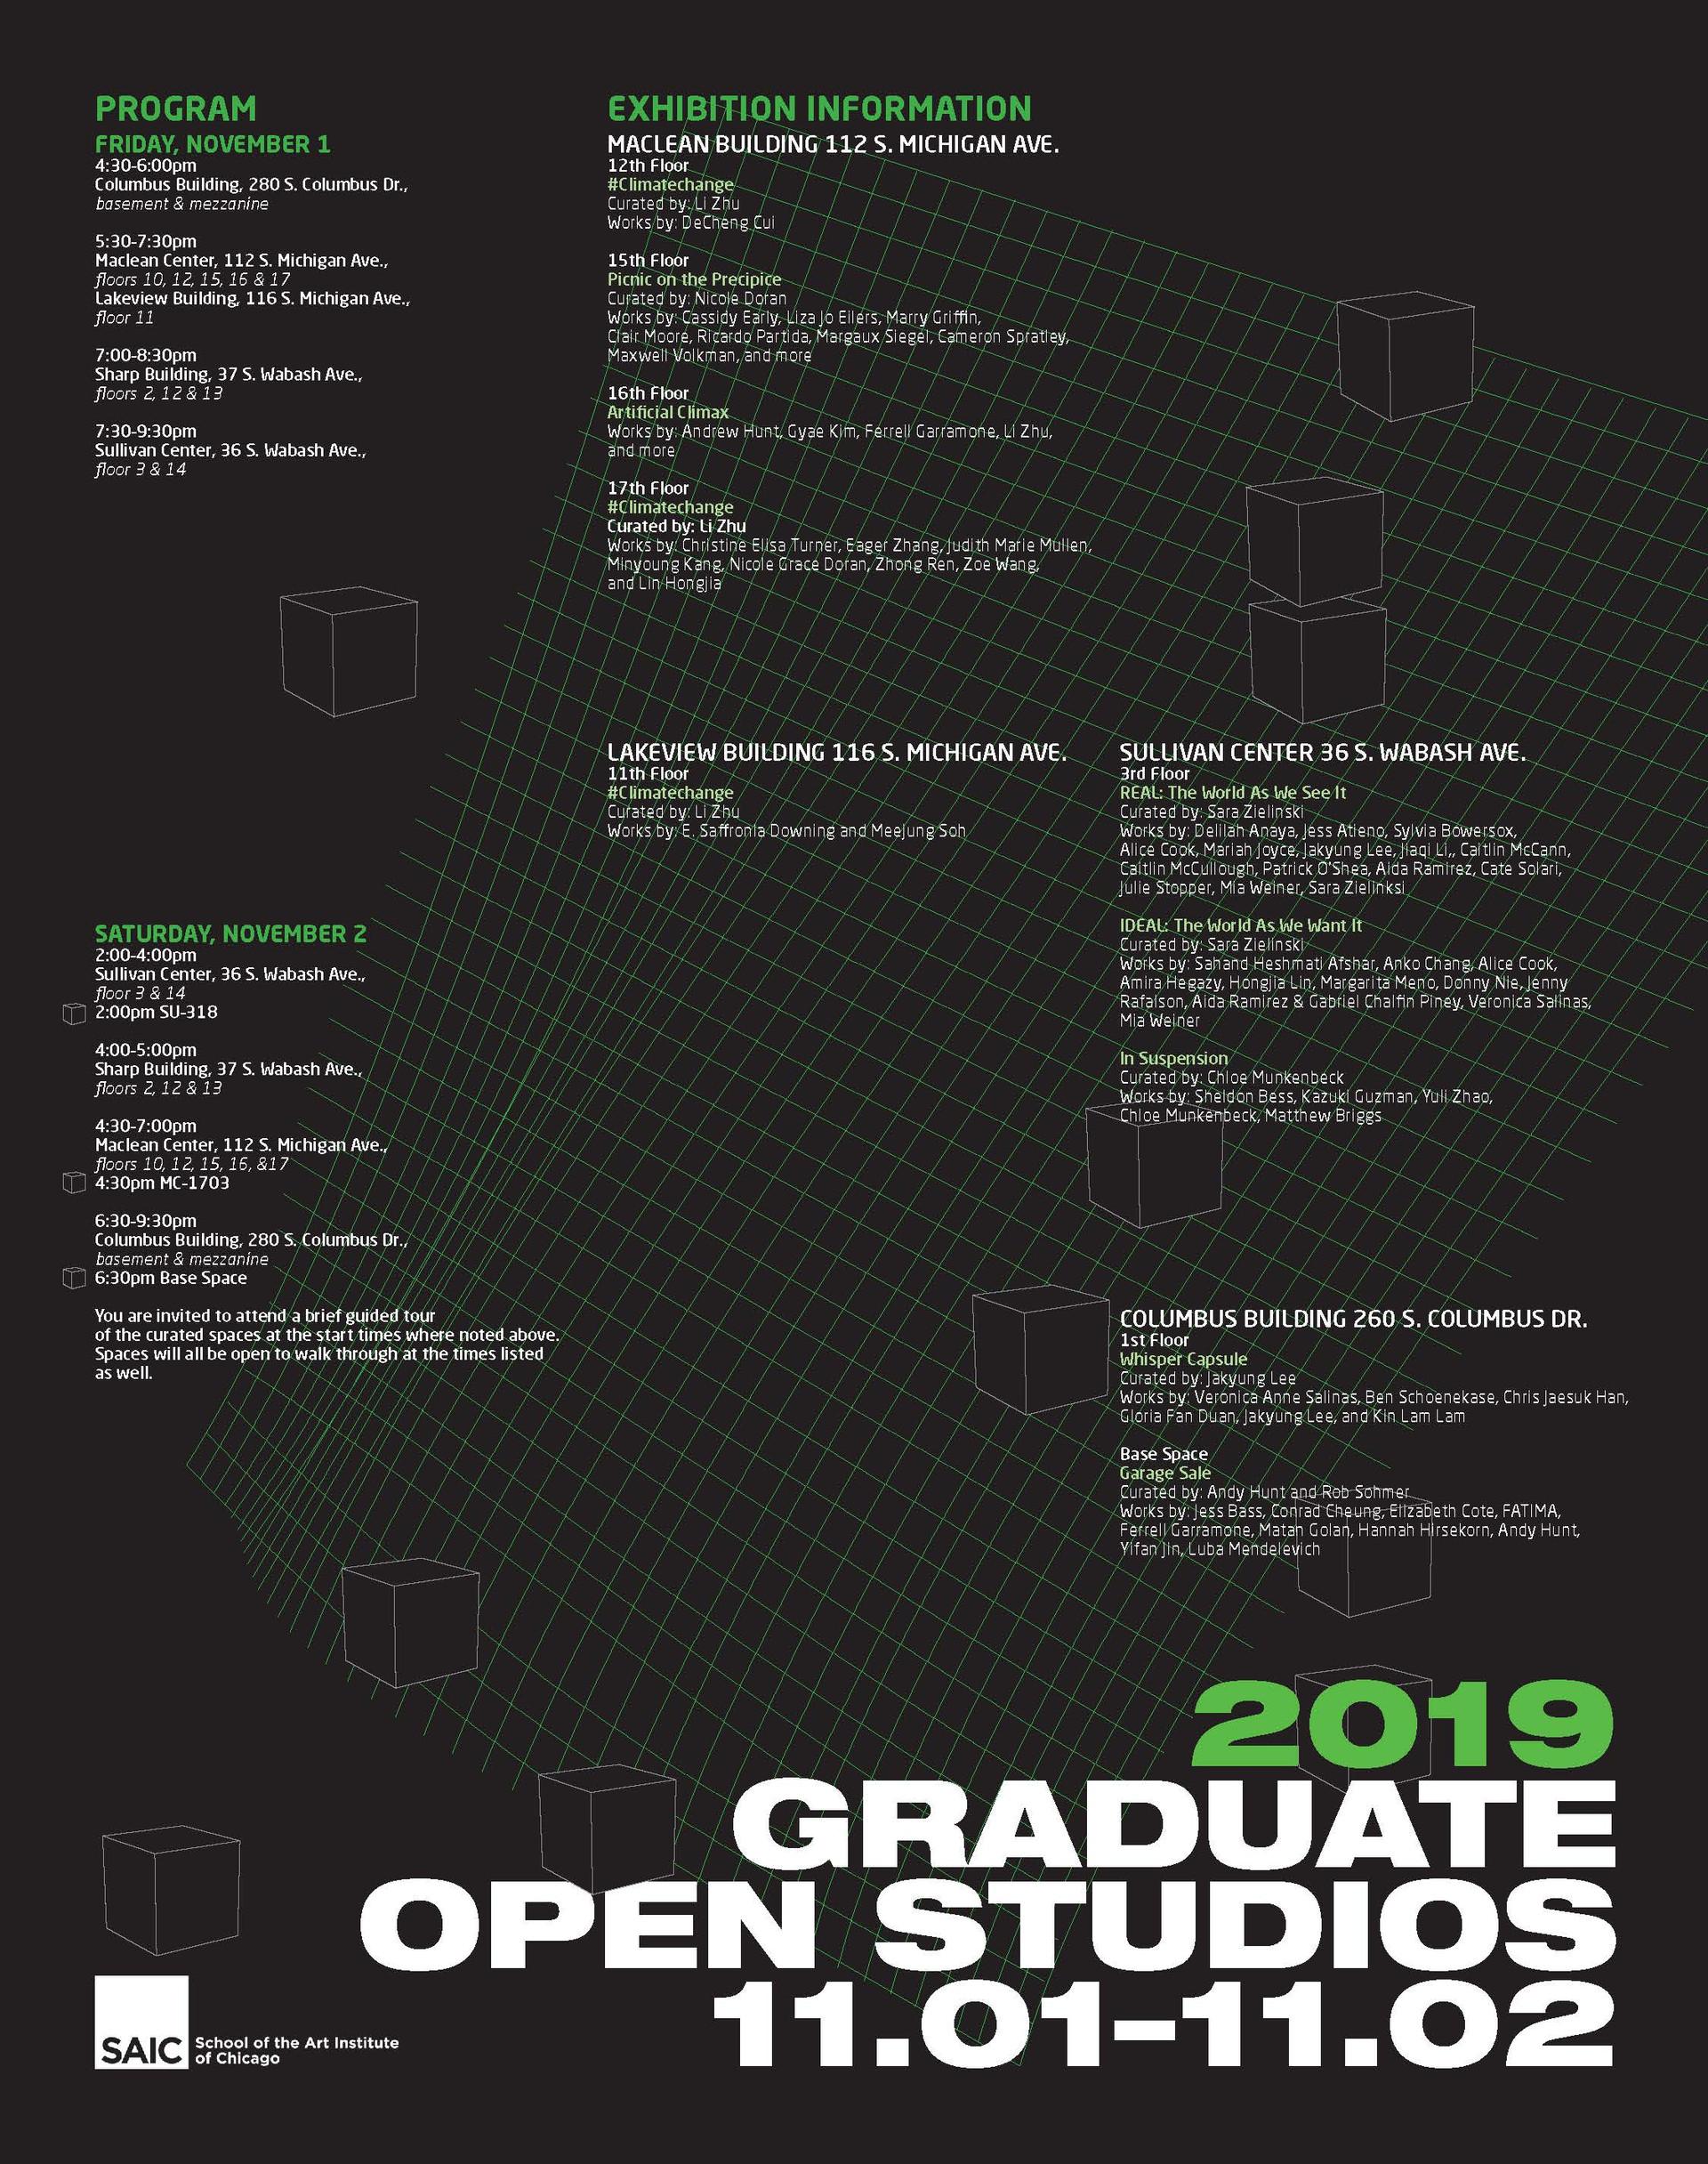 OSN-1023_RieslingD_Poster_v6_Page_2.jpg